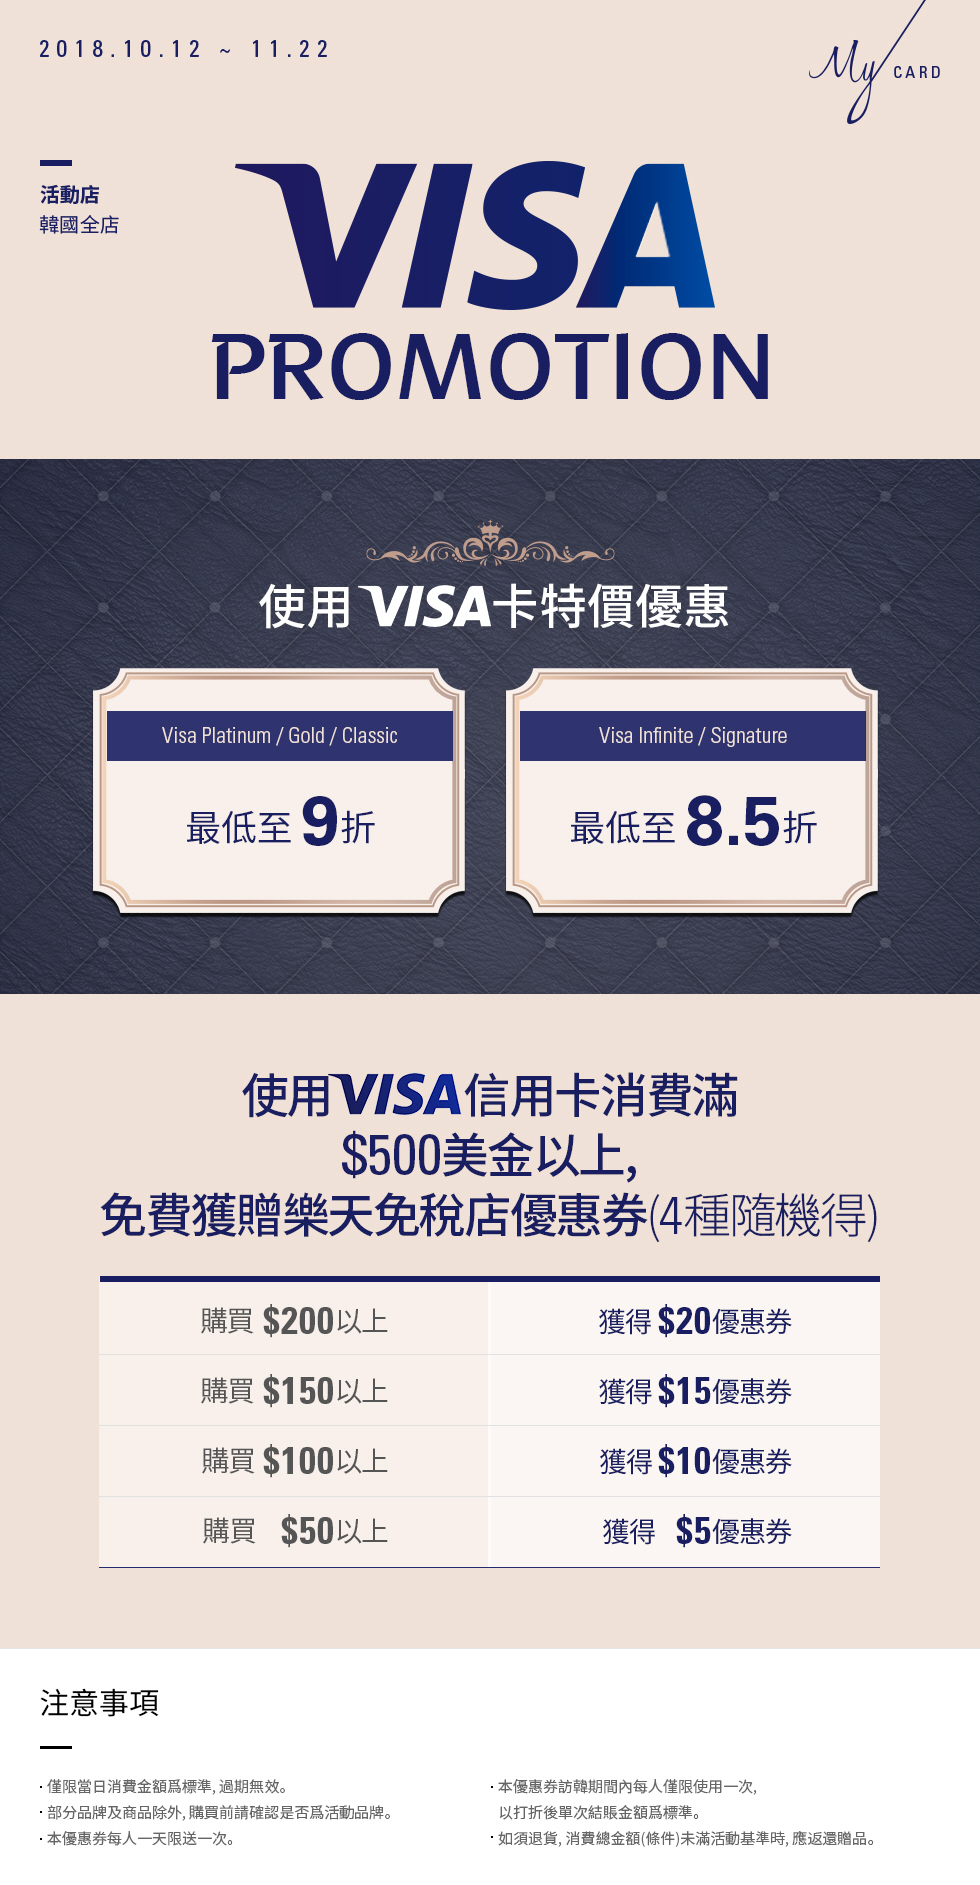 使用 Visa 卡特價優惠